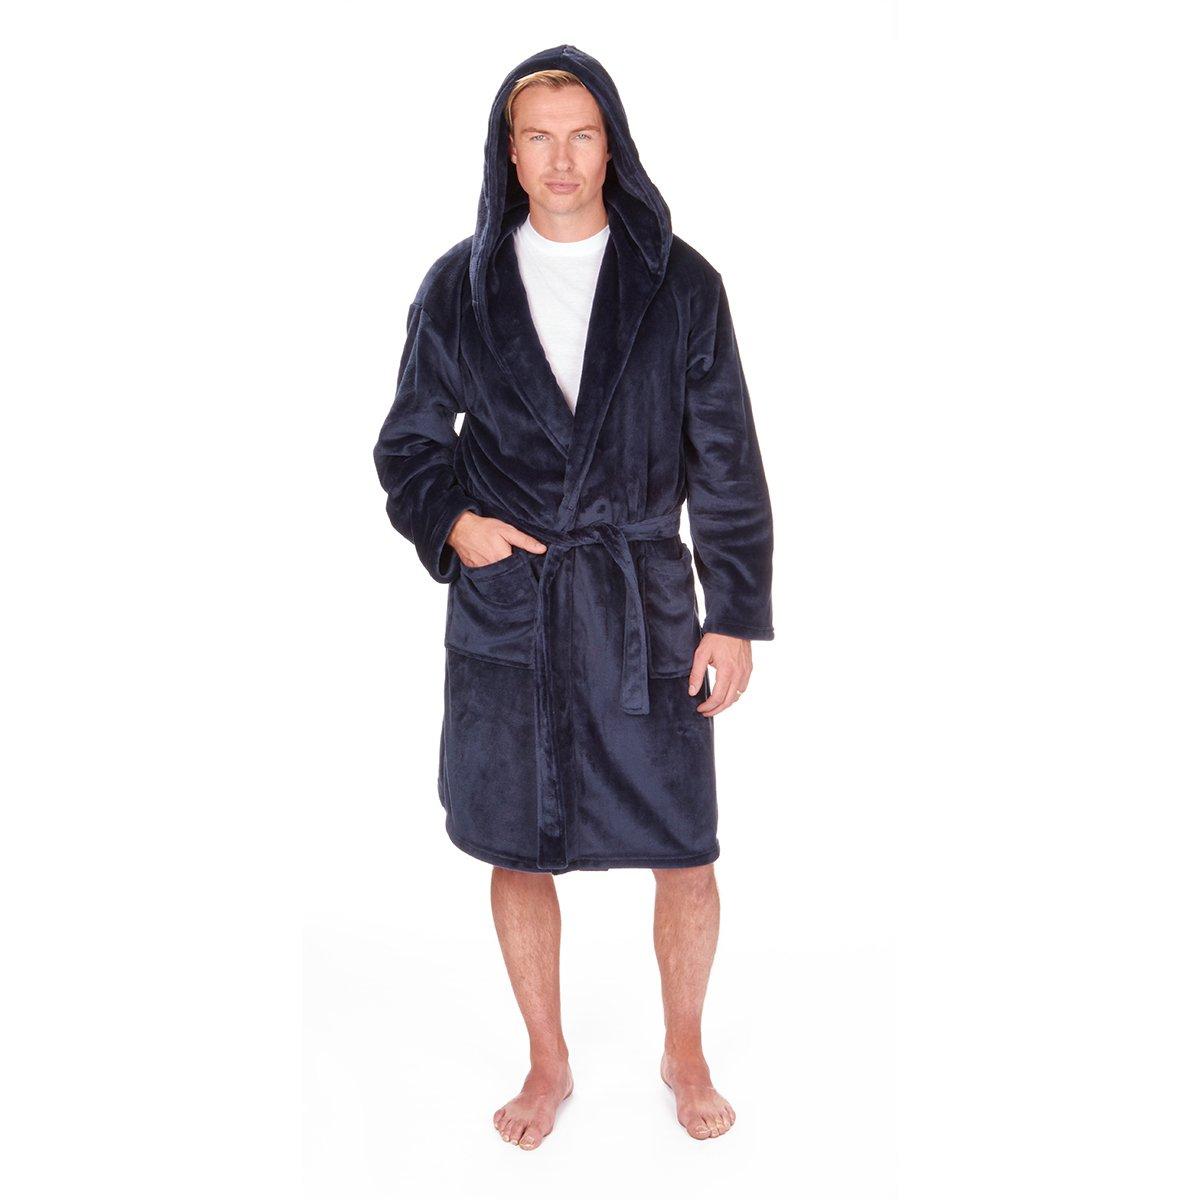 Big & Tall Men's Fleece Hooded Robe - Winter Dressing Gown - Sizes 3XL-5XL Pierre Roche